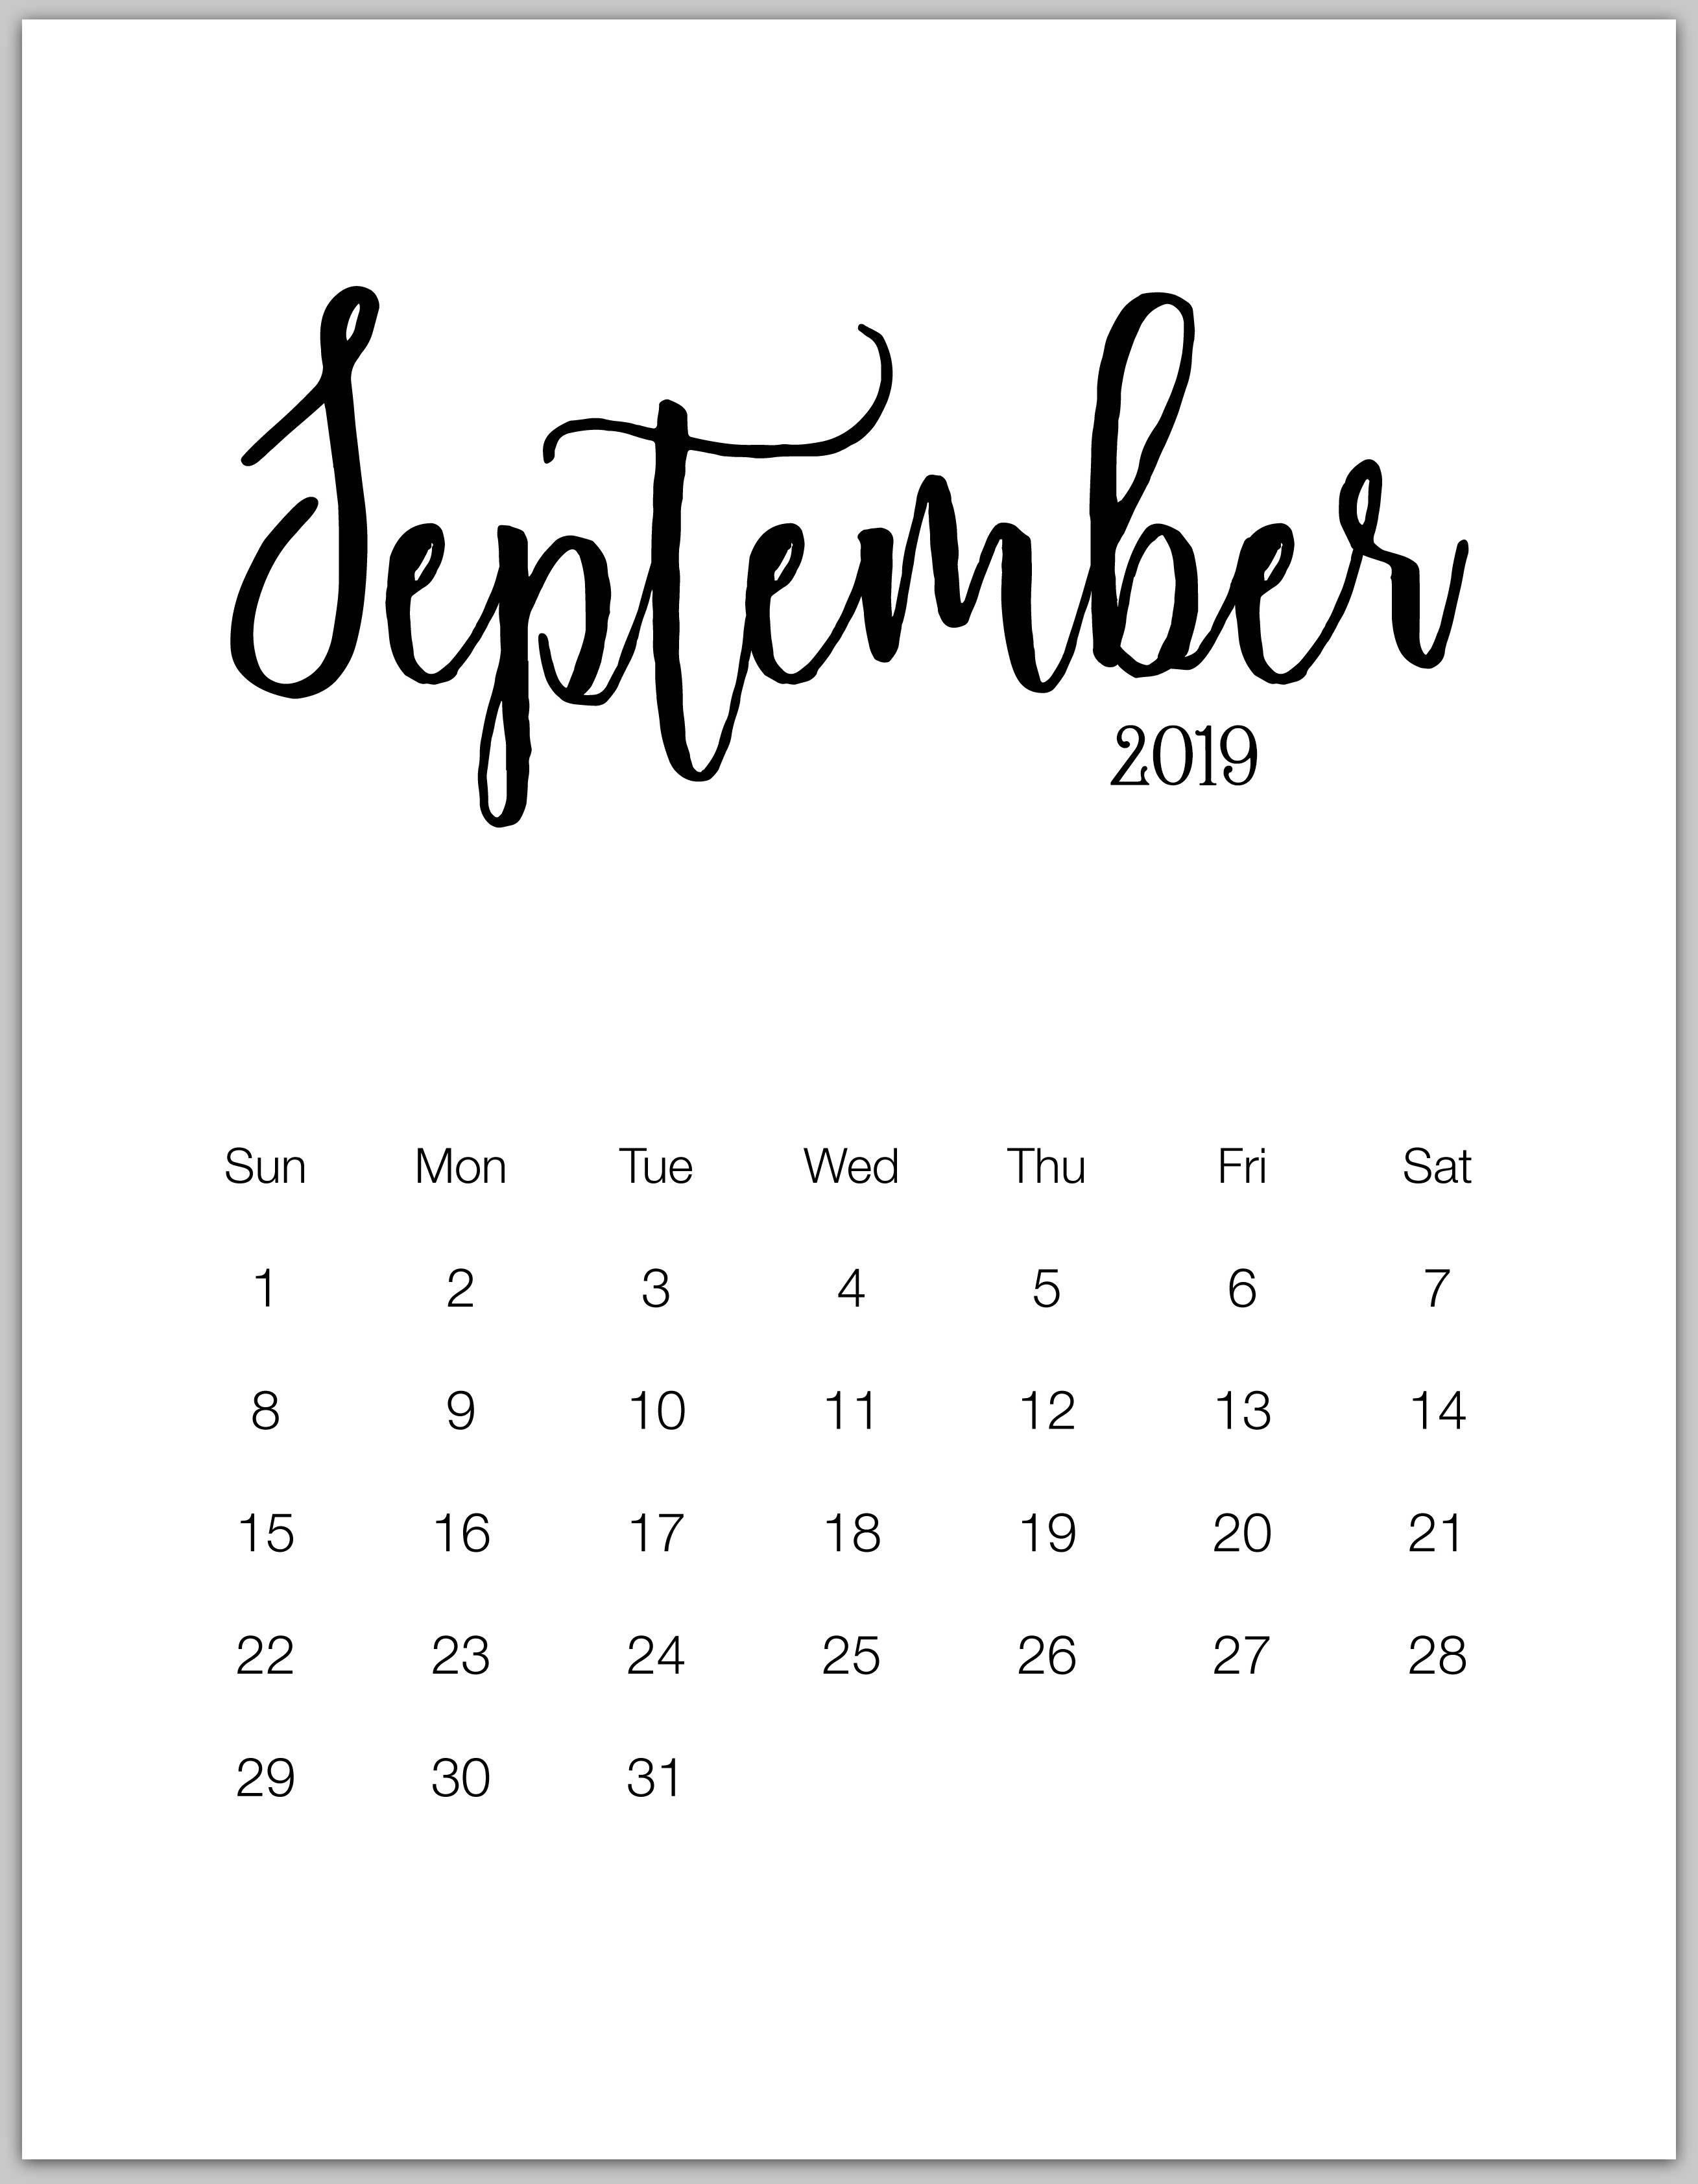 Wedding decorations at home january 2019 september  minimalist calendar   Calendars  Pinterest